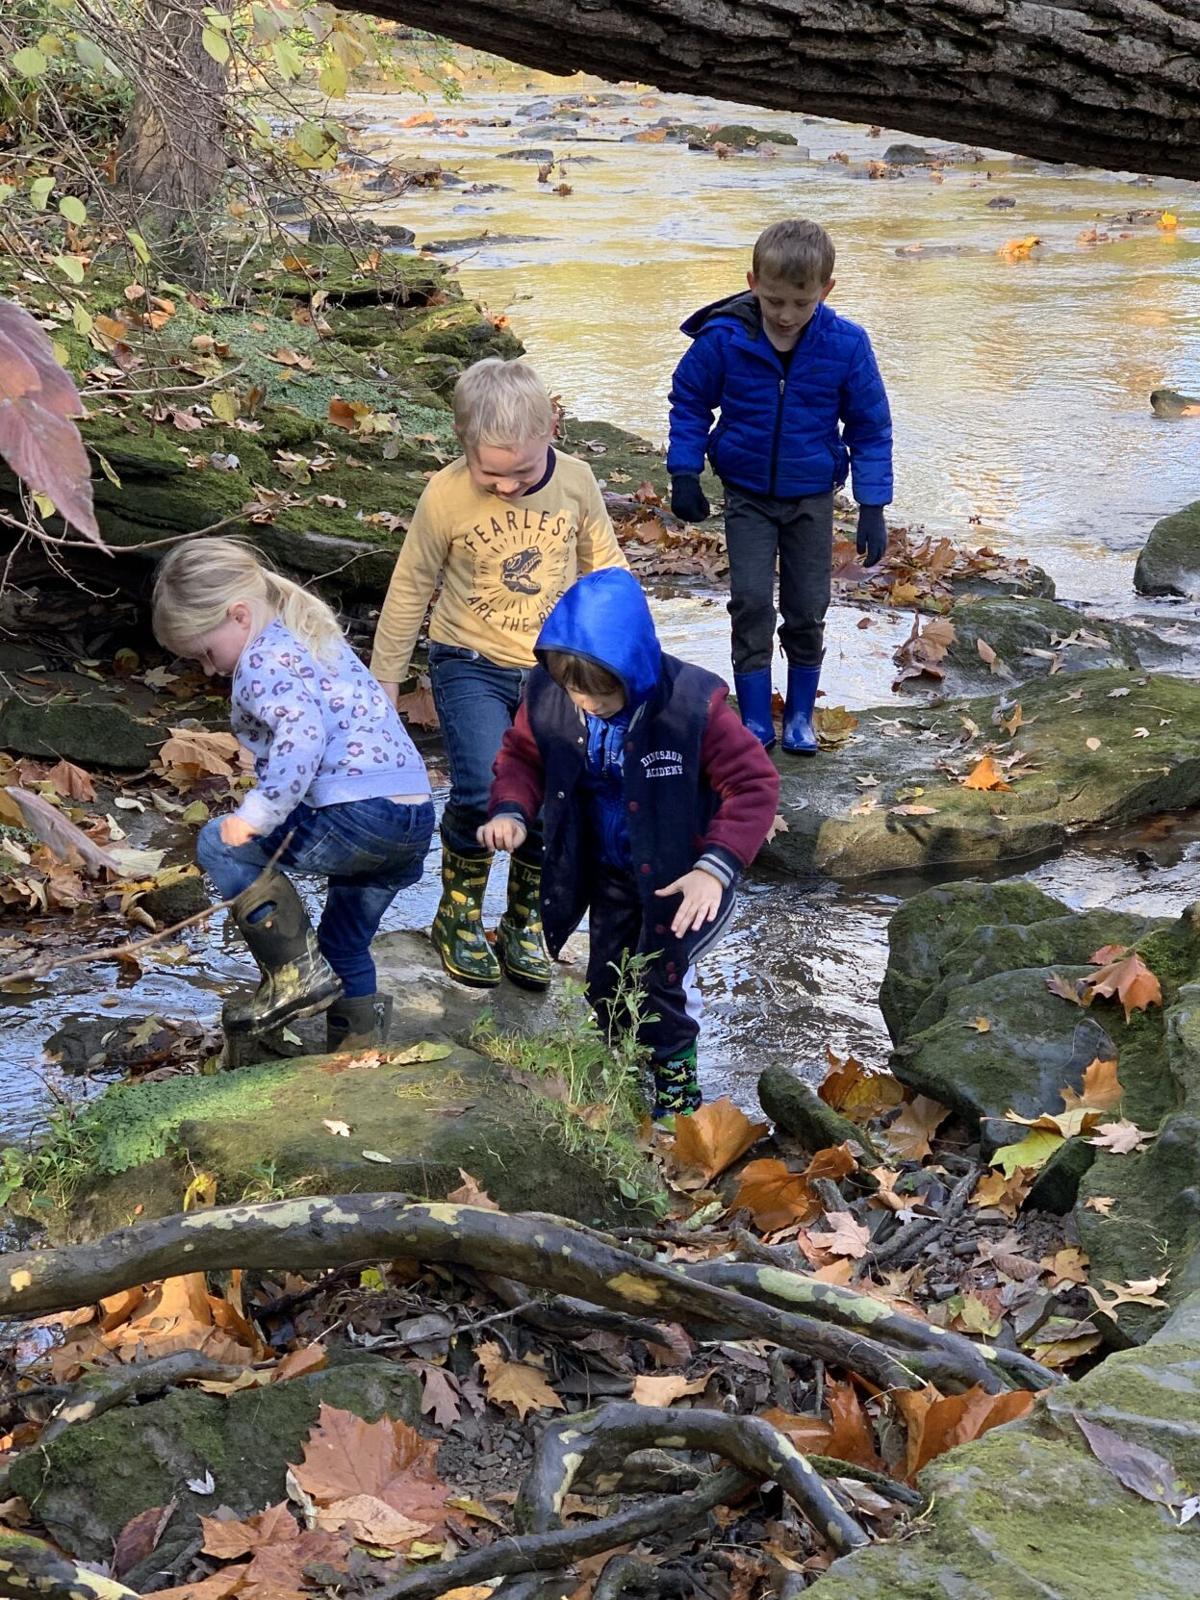 Forest Friends in Sandusky River